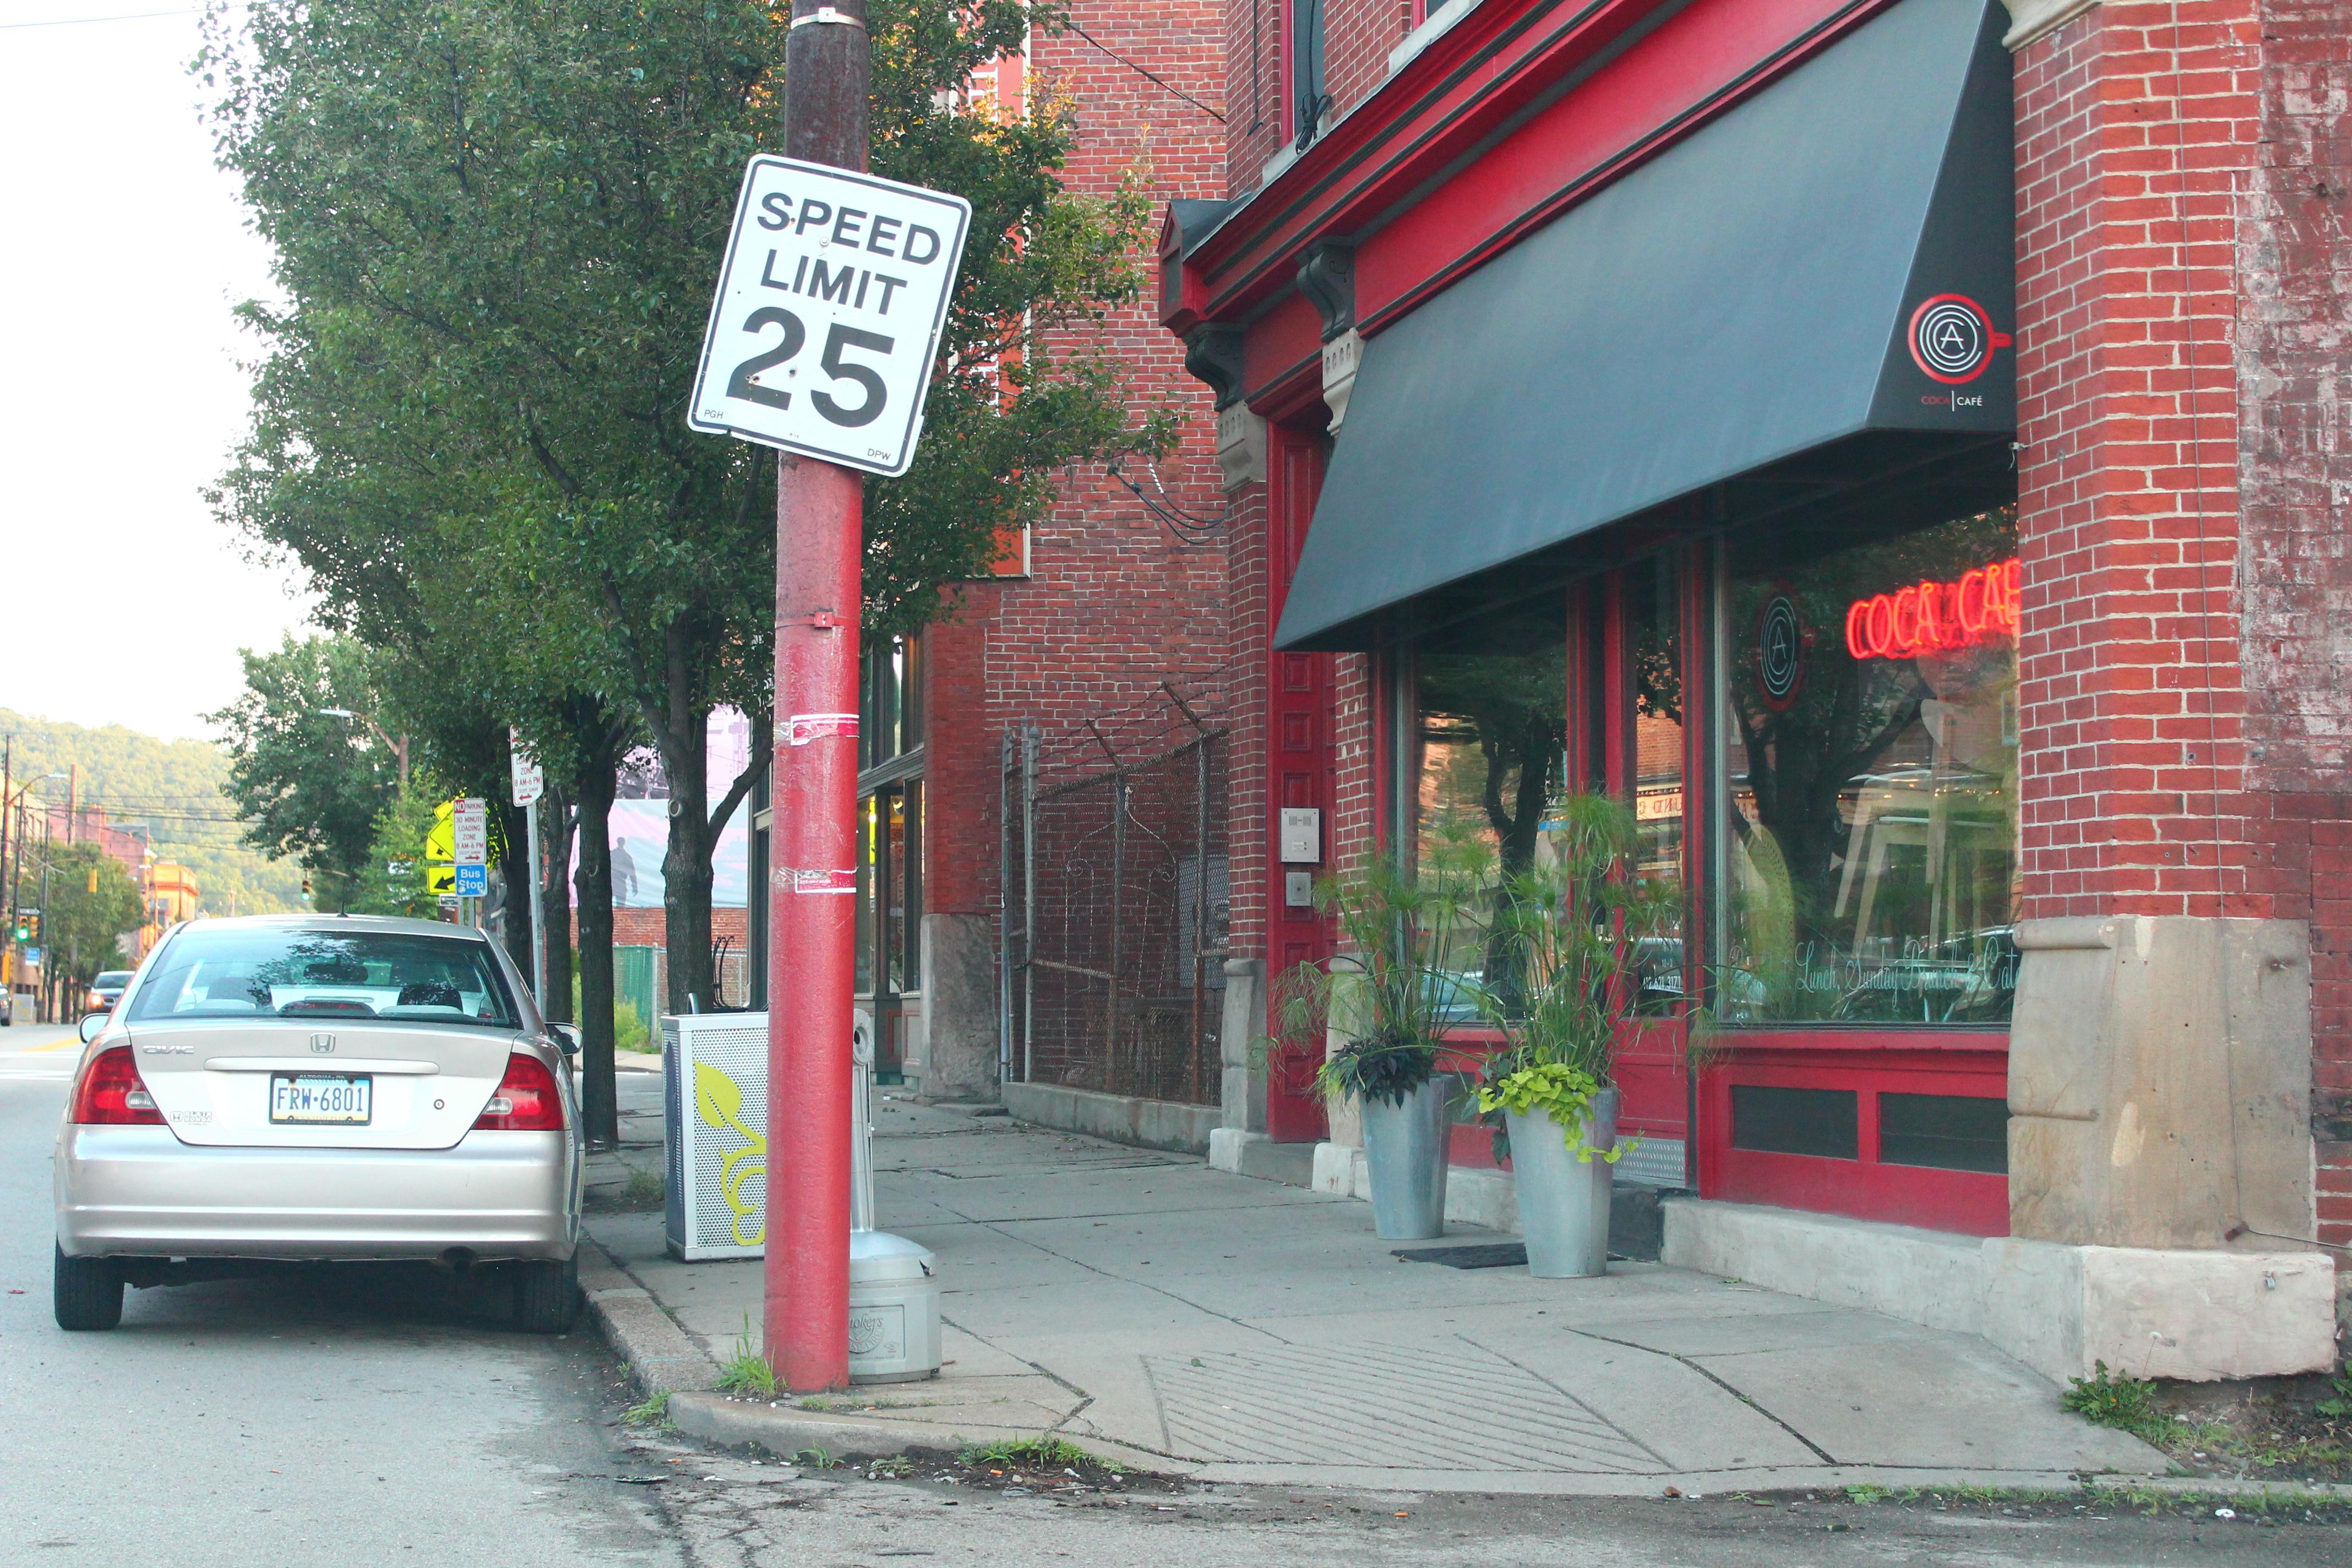 Coca Cafe, Lawrenceville, Pittsburgh, Pennsylvania, post-gayborhood